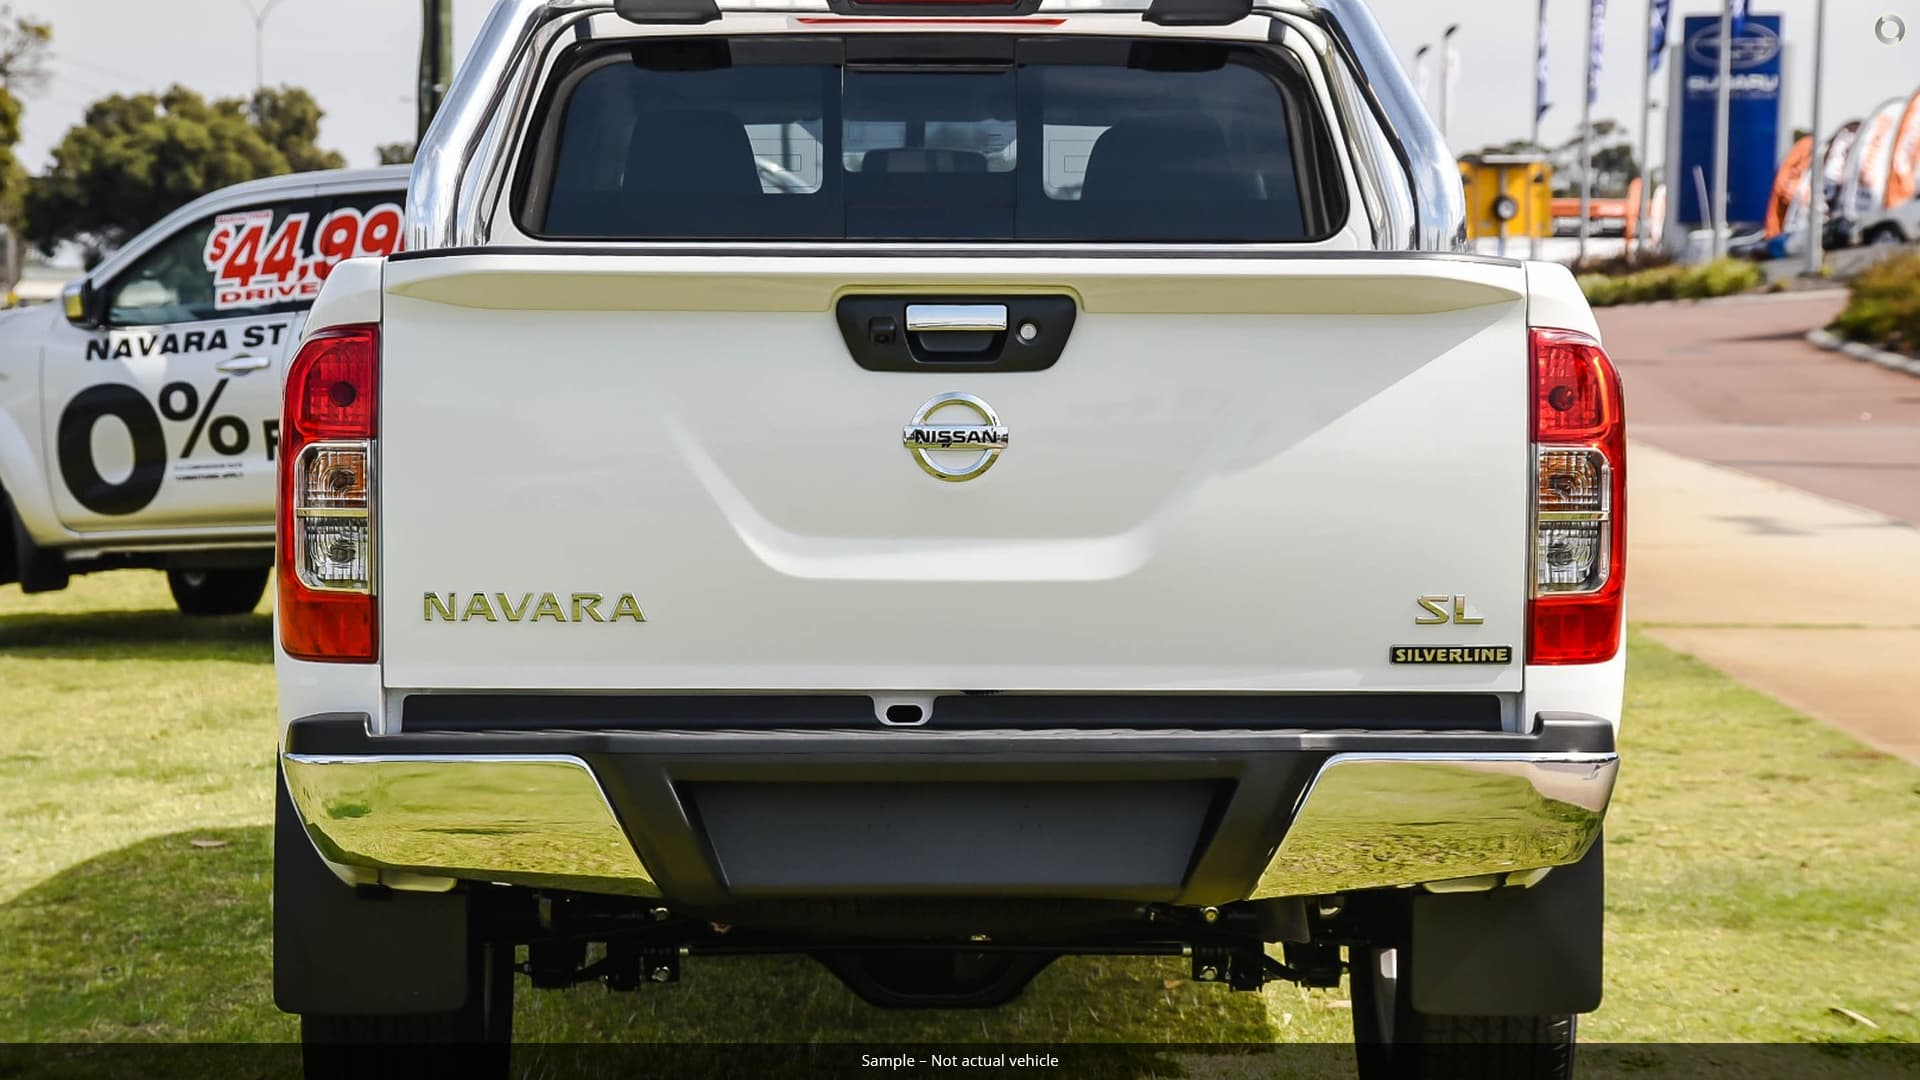 2018 Nissan Navara Silverline D23 Series 3